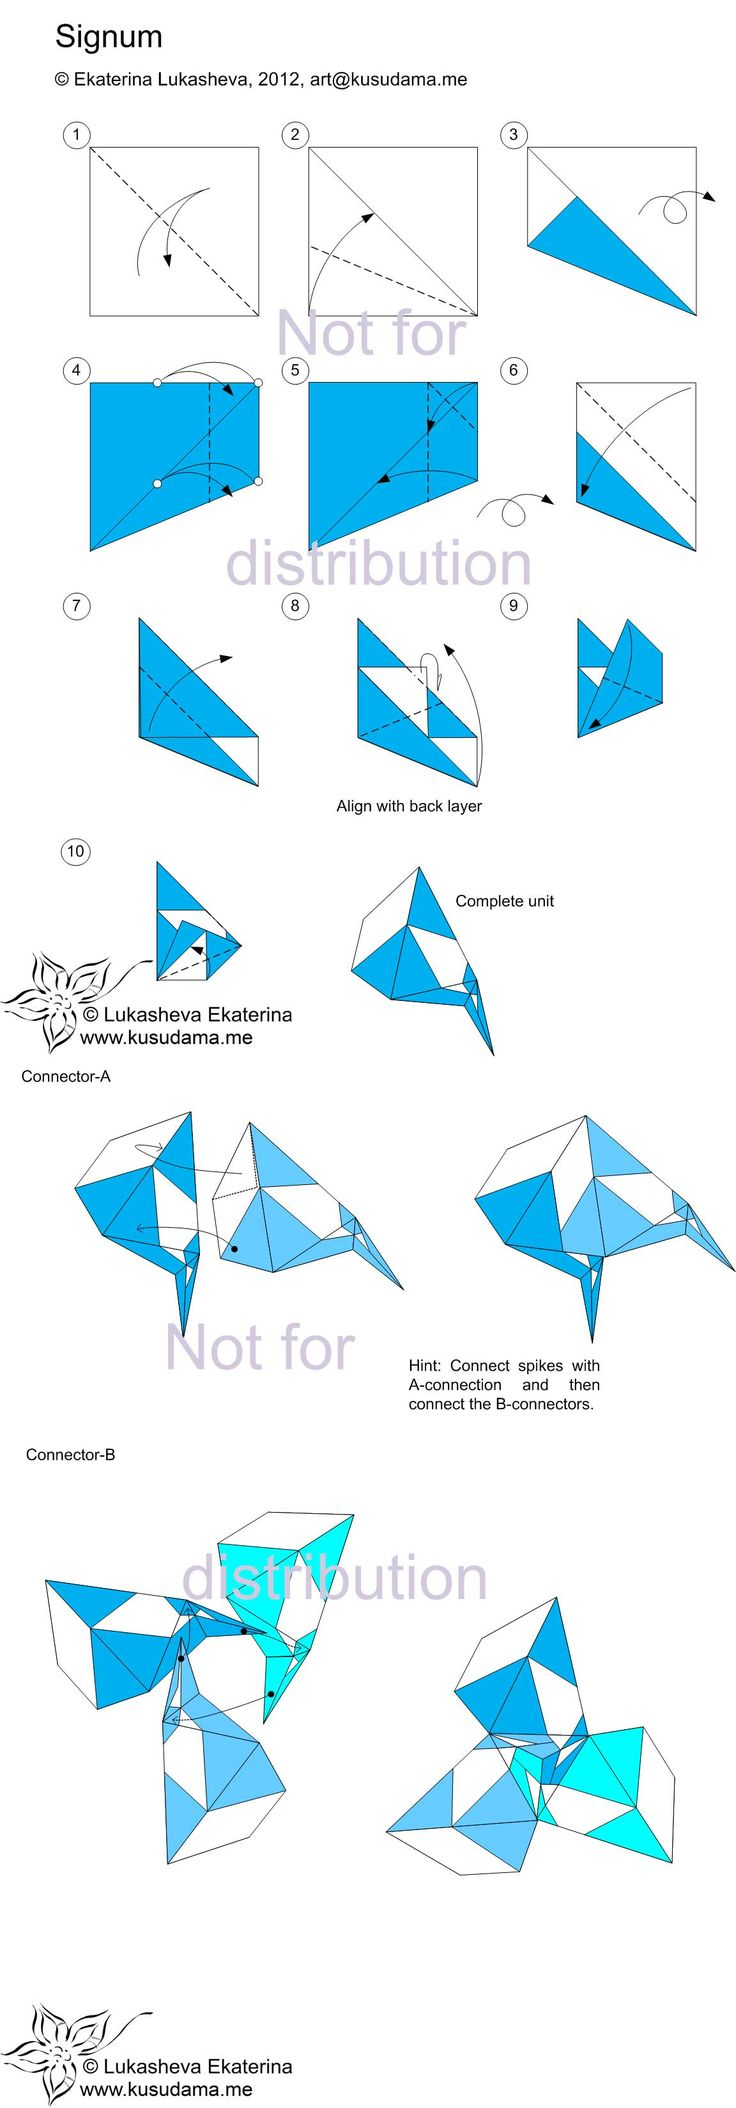 1db7f6da82d29d3c91c8c30f54324827 origami diagrams japanese origami 311 best origami kusudama images on pinterest modular origami modular origami diagrams at gsmportal.co